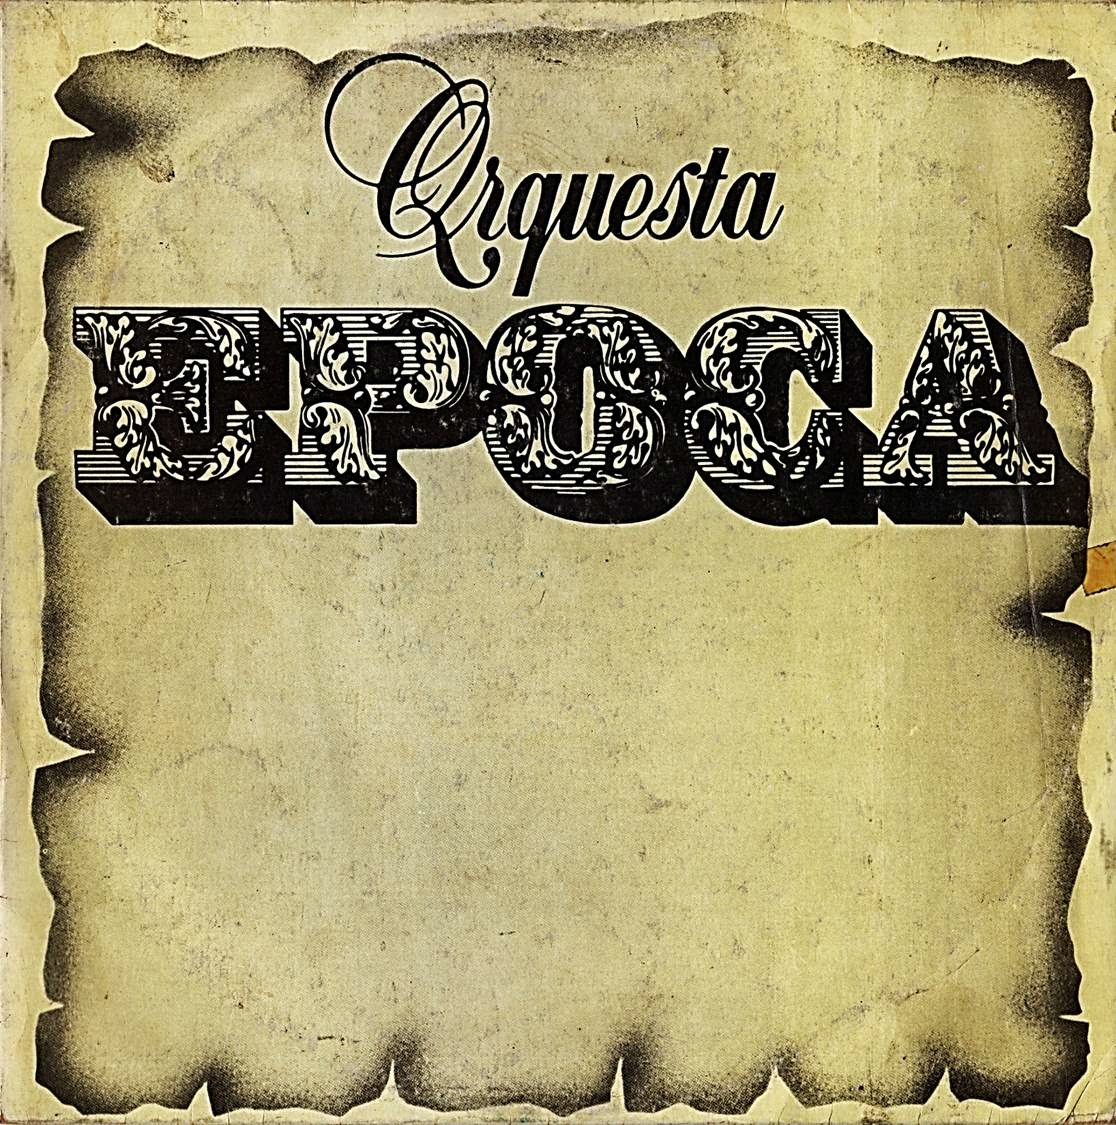 ORQUESTA EPOCA - ORQUESTA EPOCA (1980)